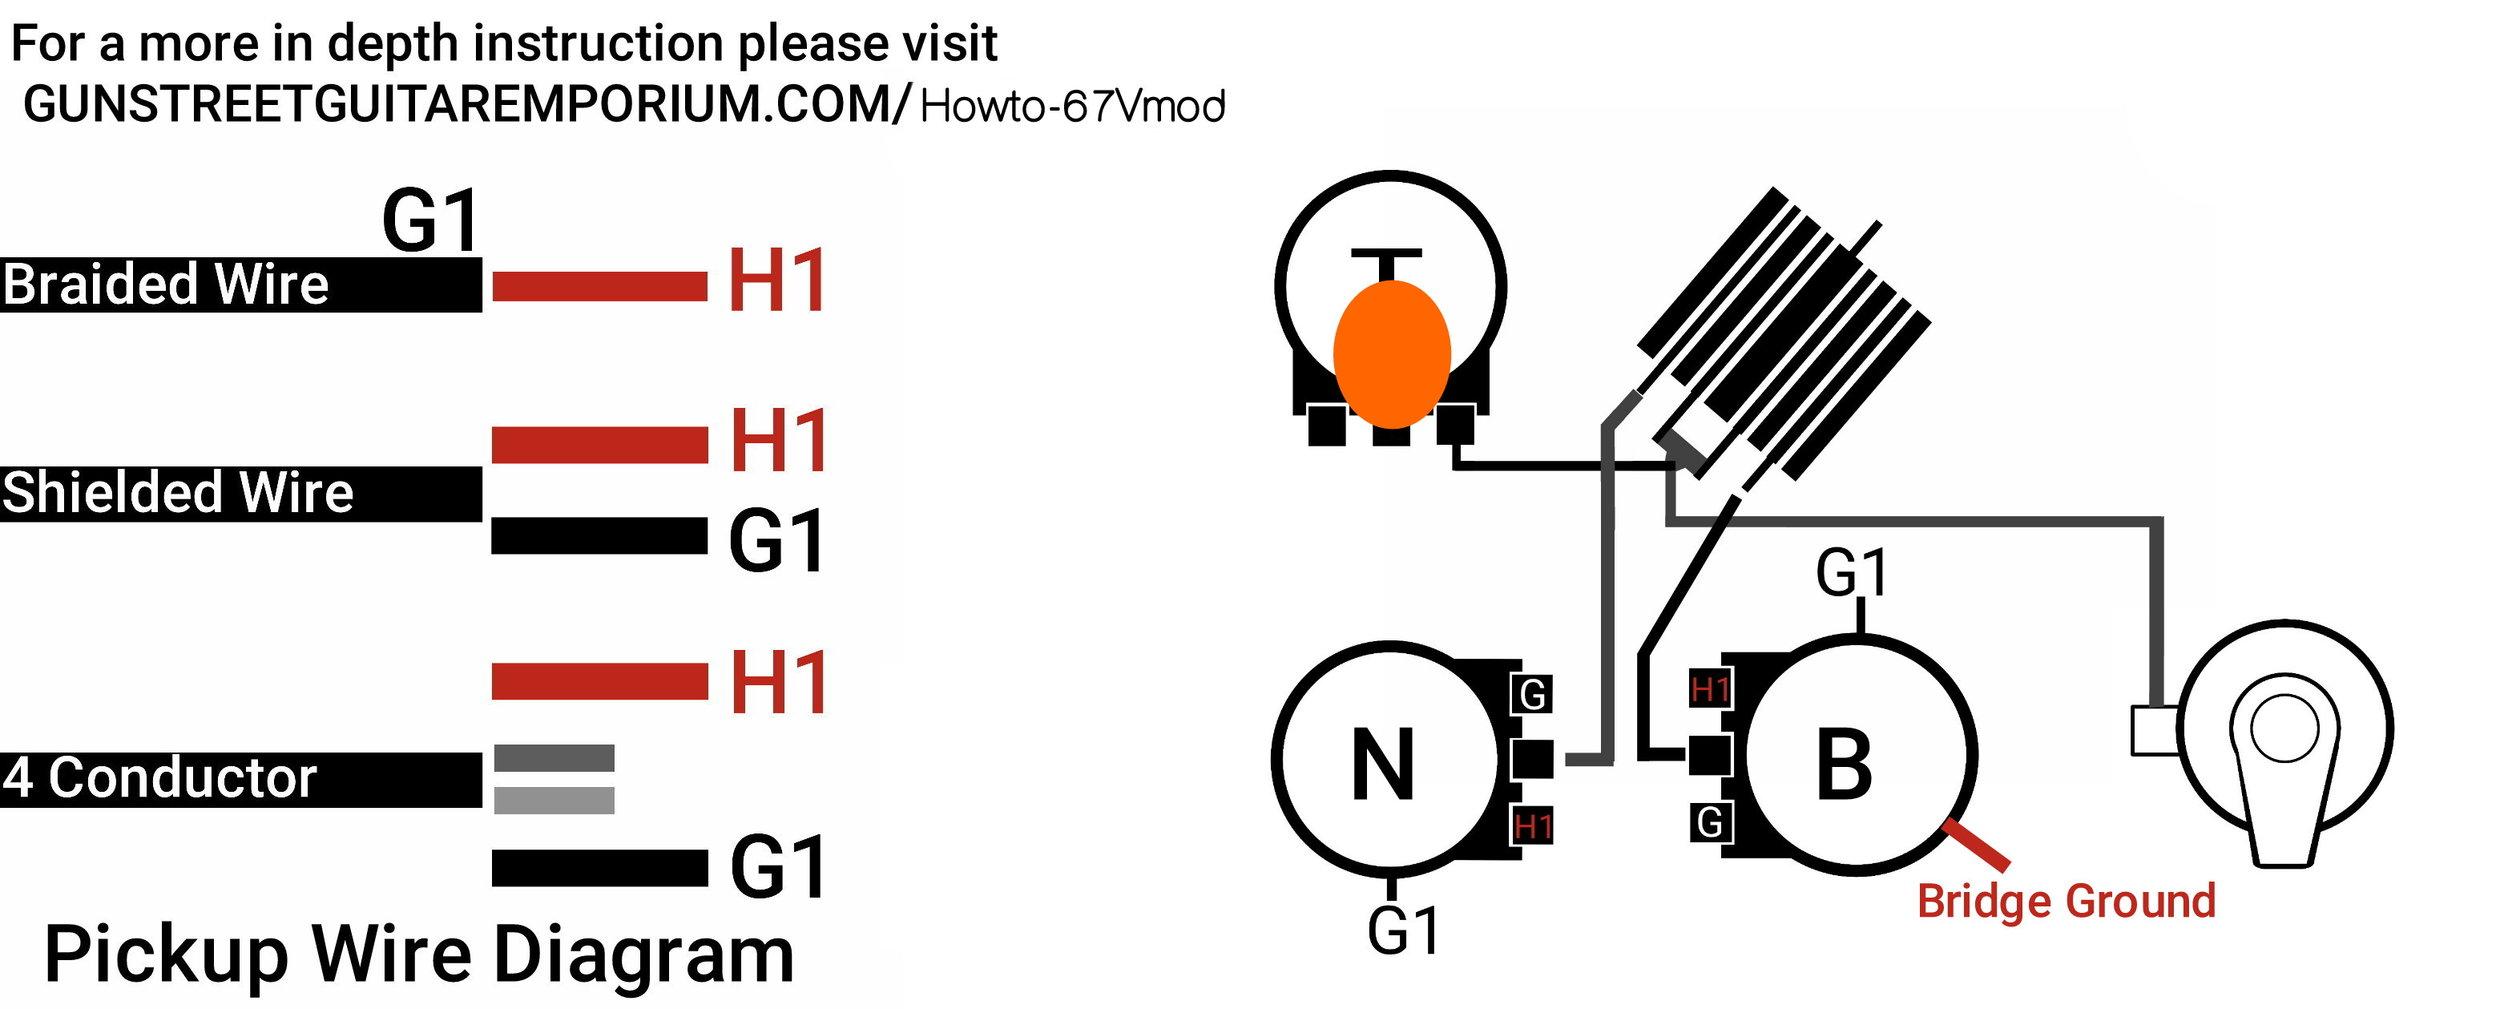 67 flying v how to install Modern wiring — GUNSTREET- A